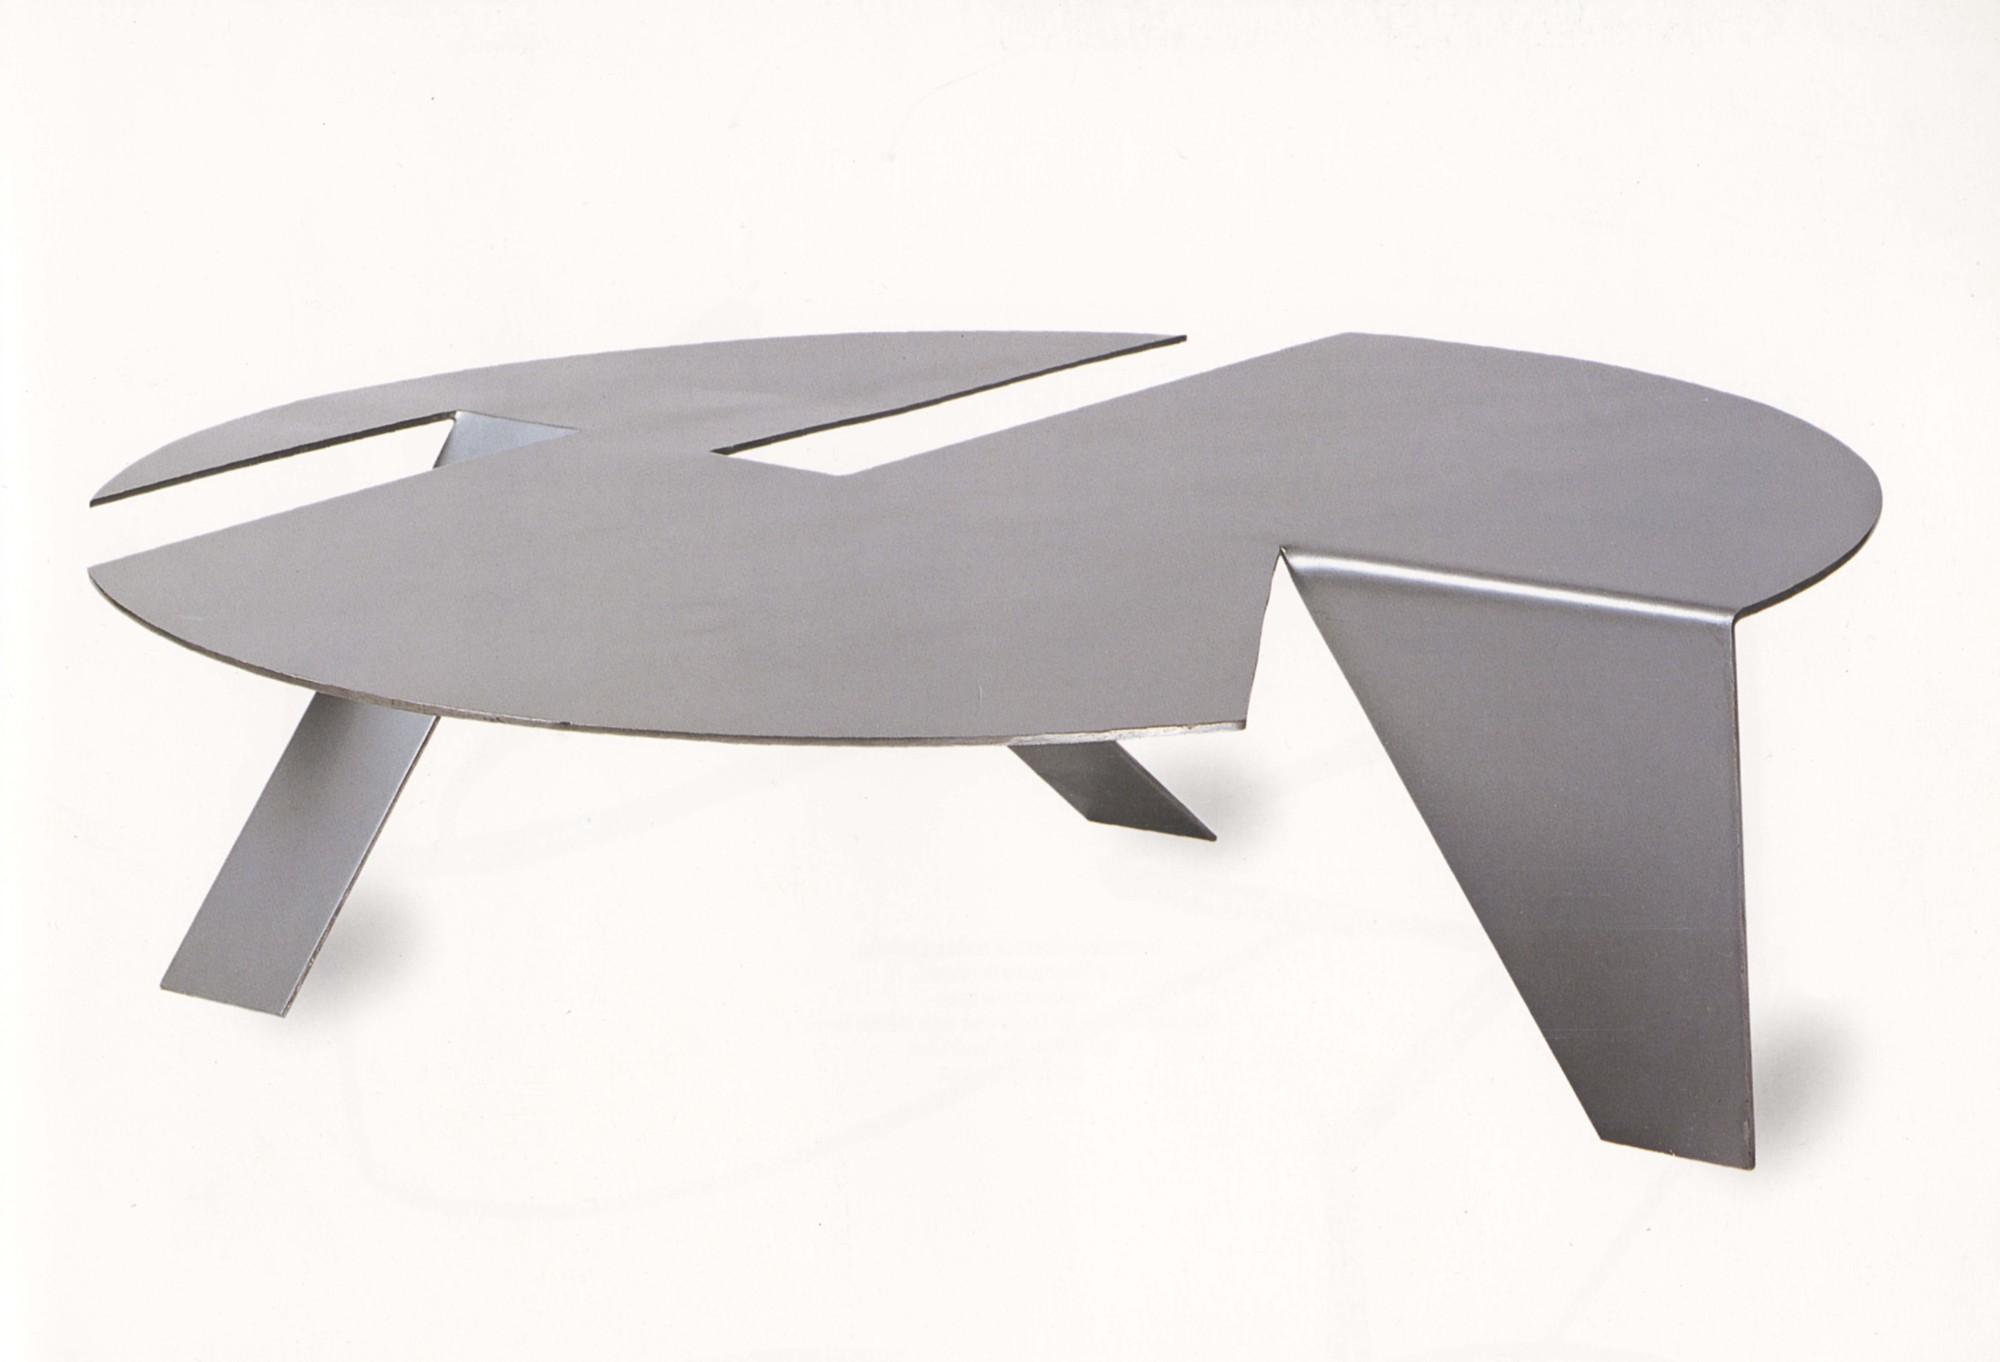 "mesa de jardim jumbo : mesa de jardim jumbo:Instituto Tomie Ohtake apresenta a mostra ""Ruy Ohtake"